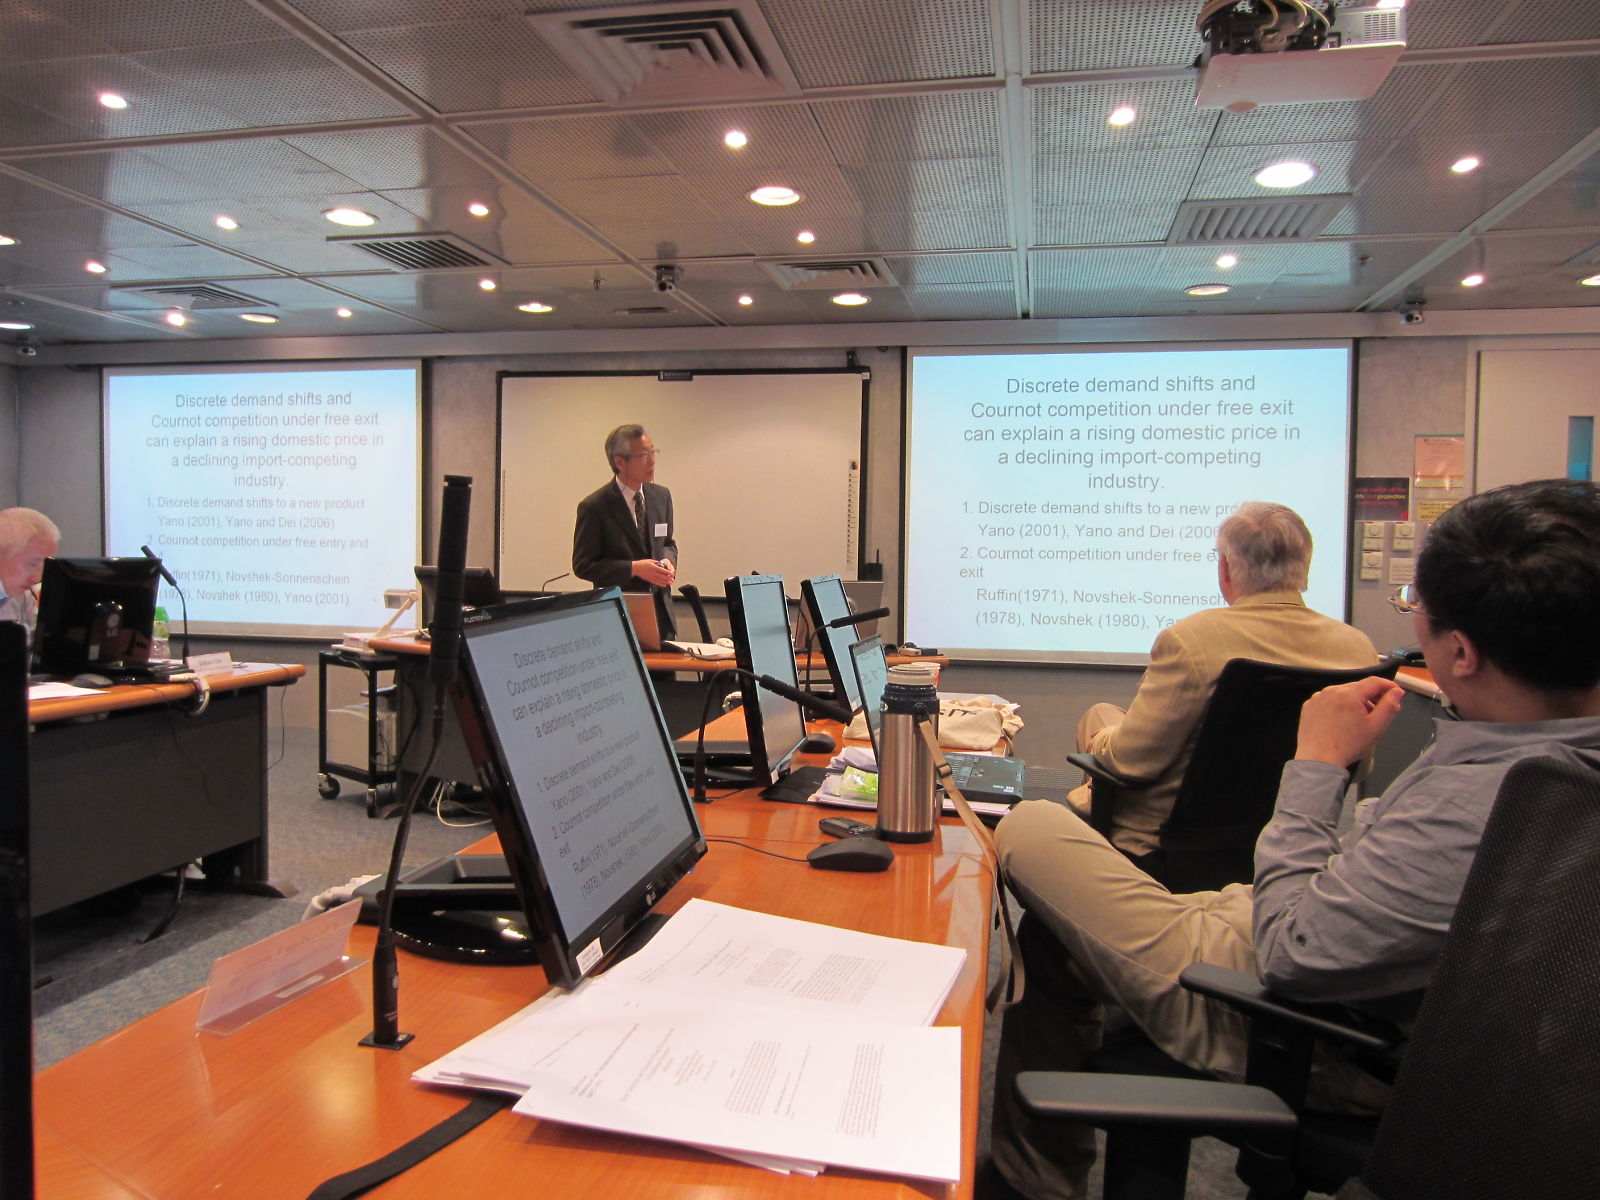 Prof Dei's presentation